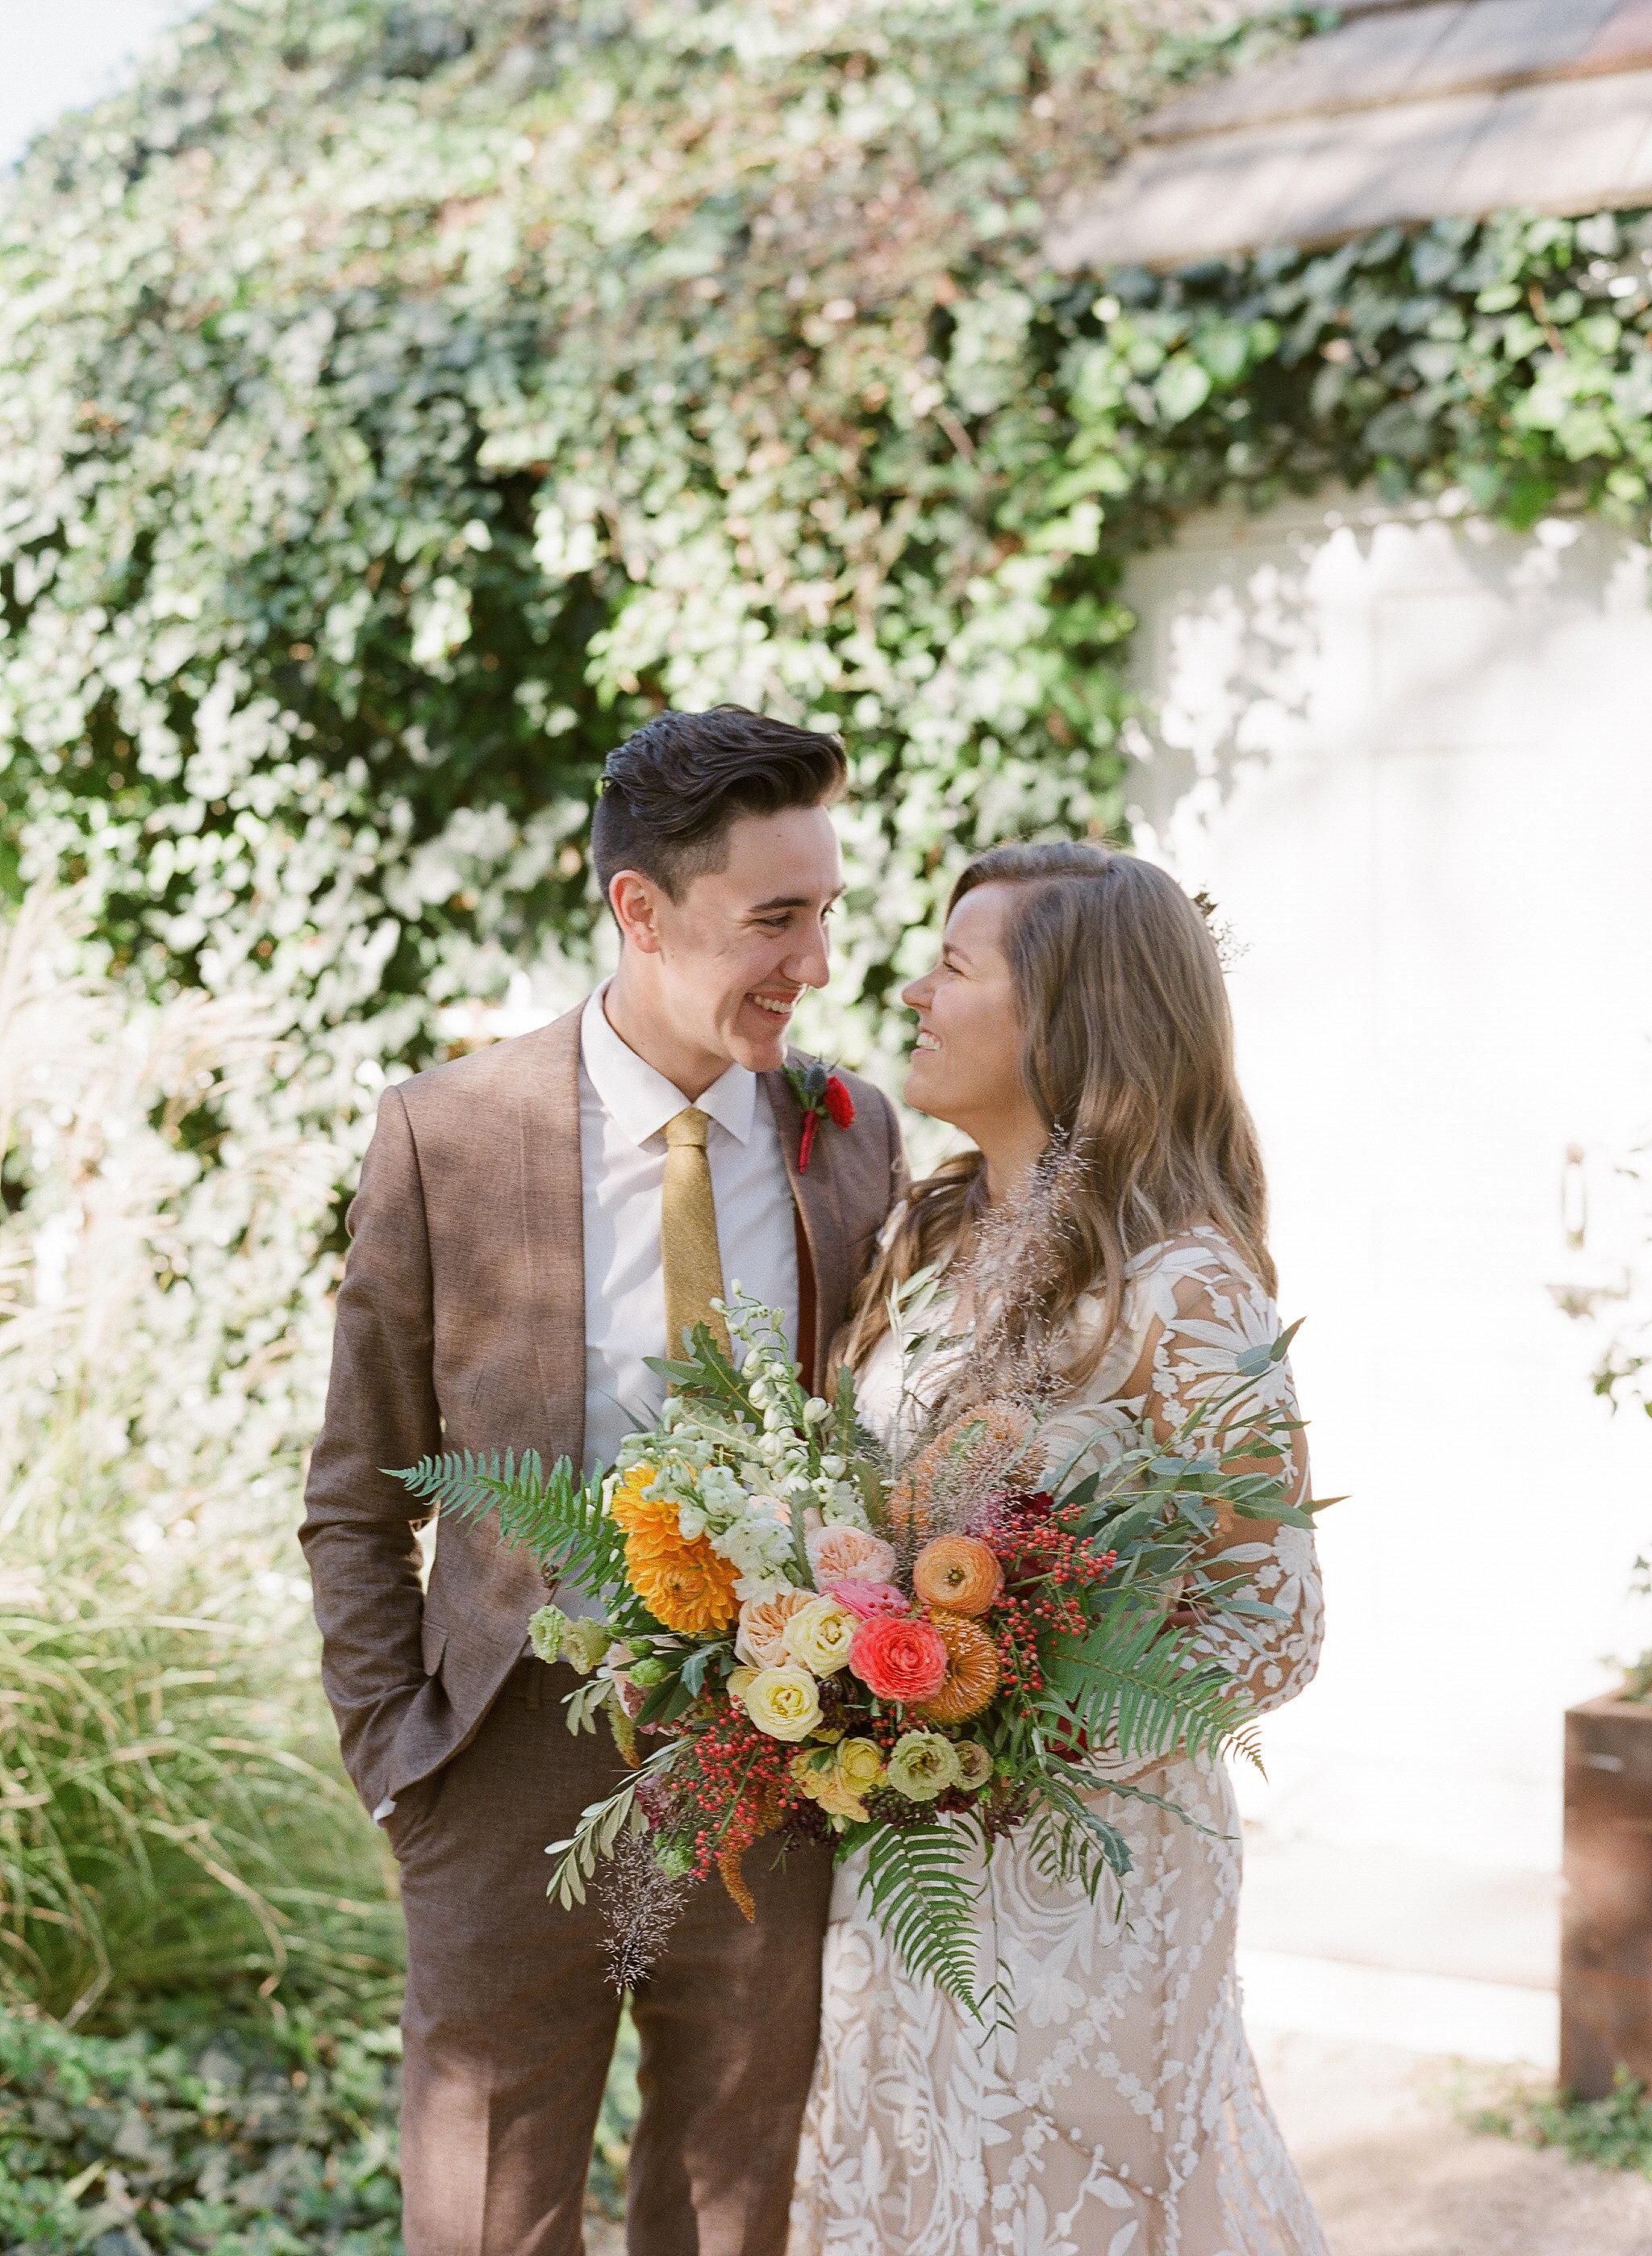 hayleigh corey wedding first look couple bride and groom